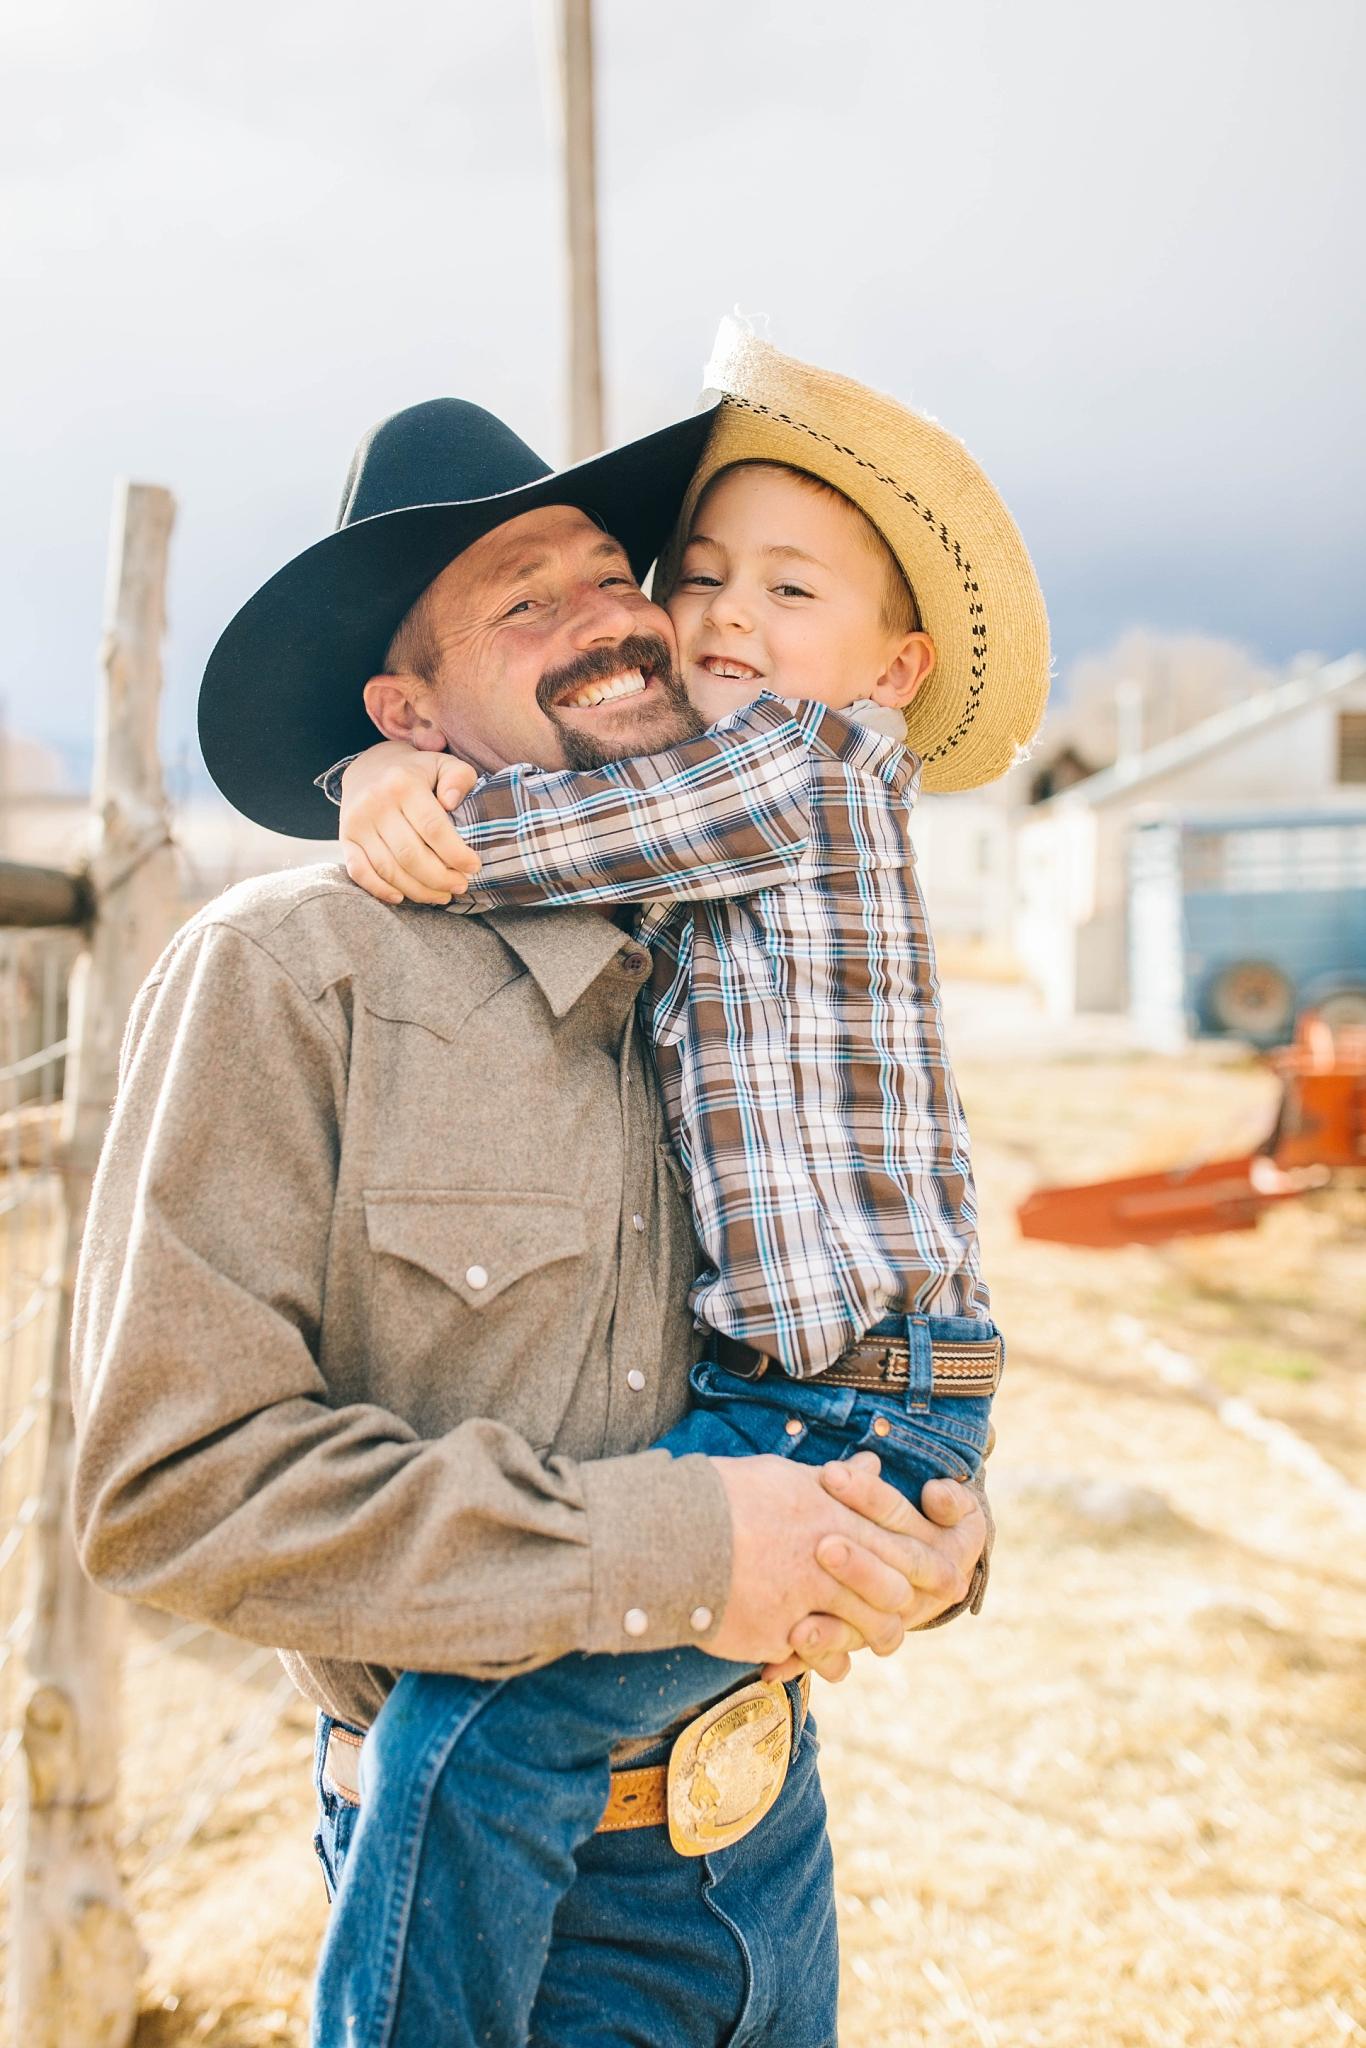 Lister-35_Lizzie-B-Imagery-Utah-Family-Photographer-Lifestyle-Photography-Salt-Lake-City-Park-City-Utah-County-Farm-Family-Session.jpg